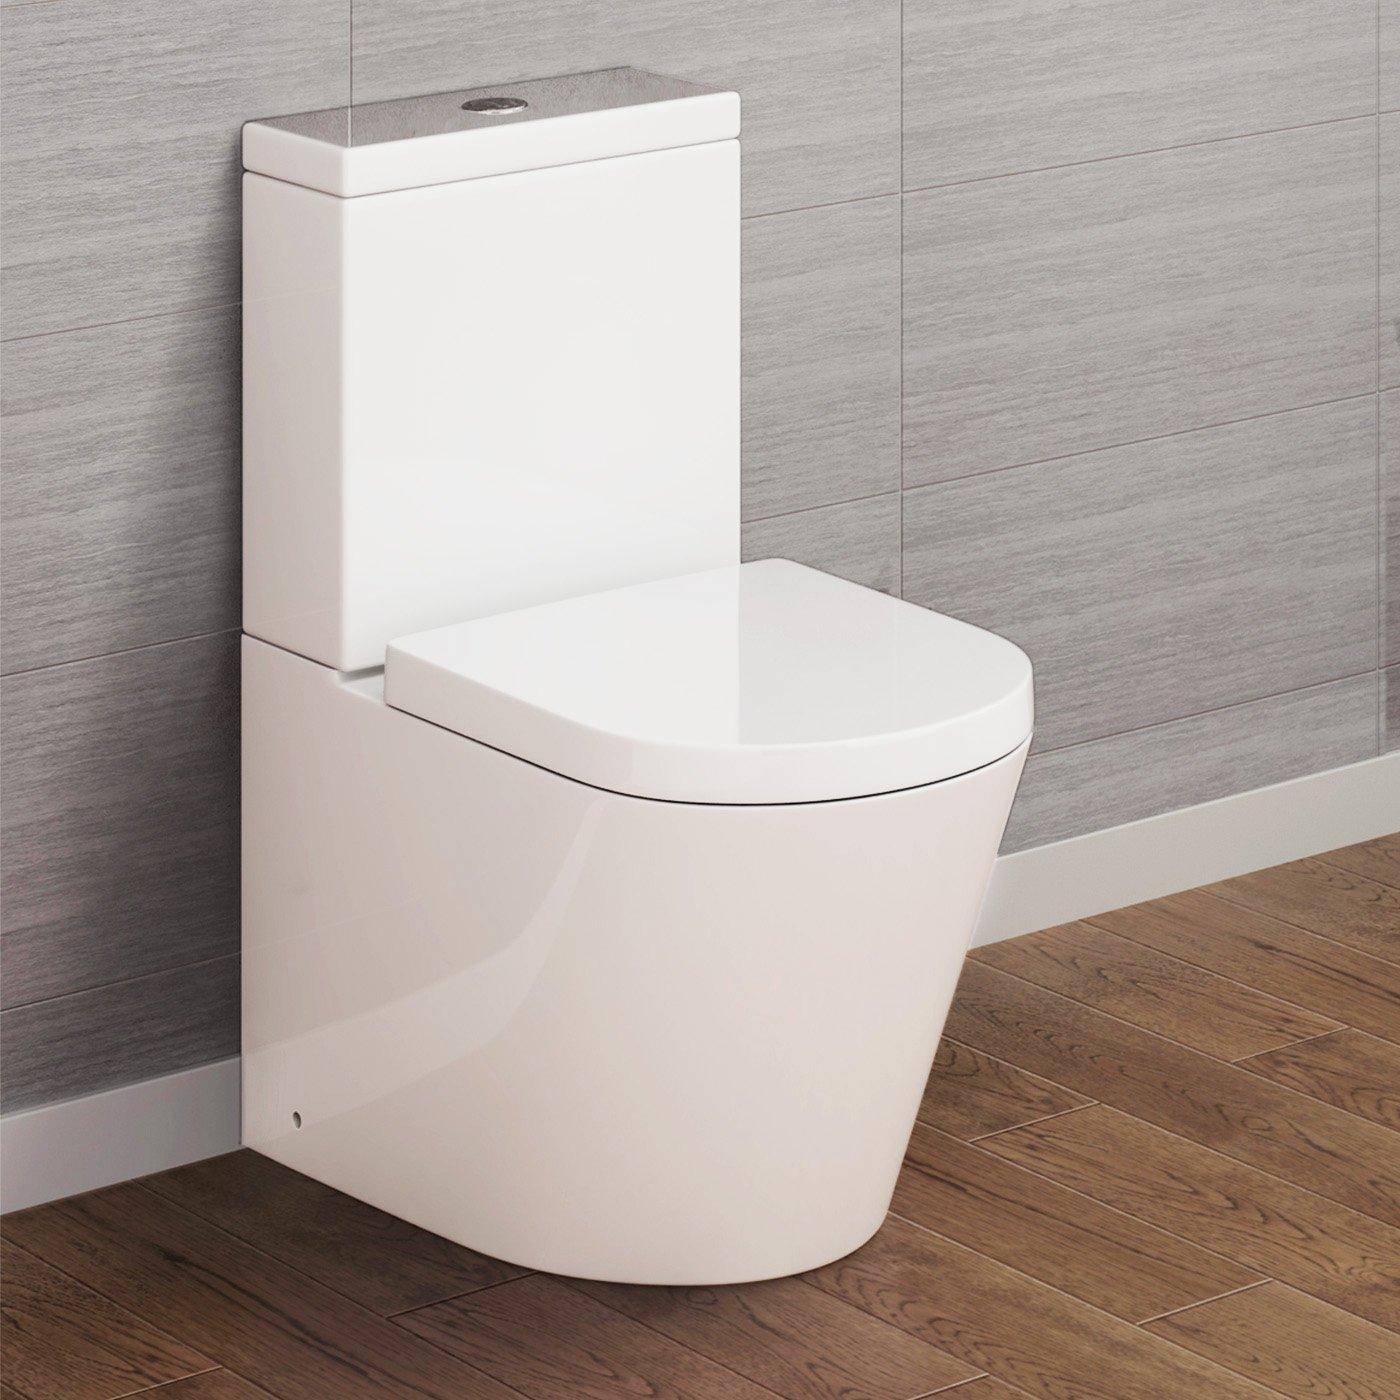 Luxury Bathroom White Gloss Close Coupled Toilet Cistern Pan + Seat iBathUK